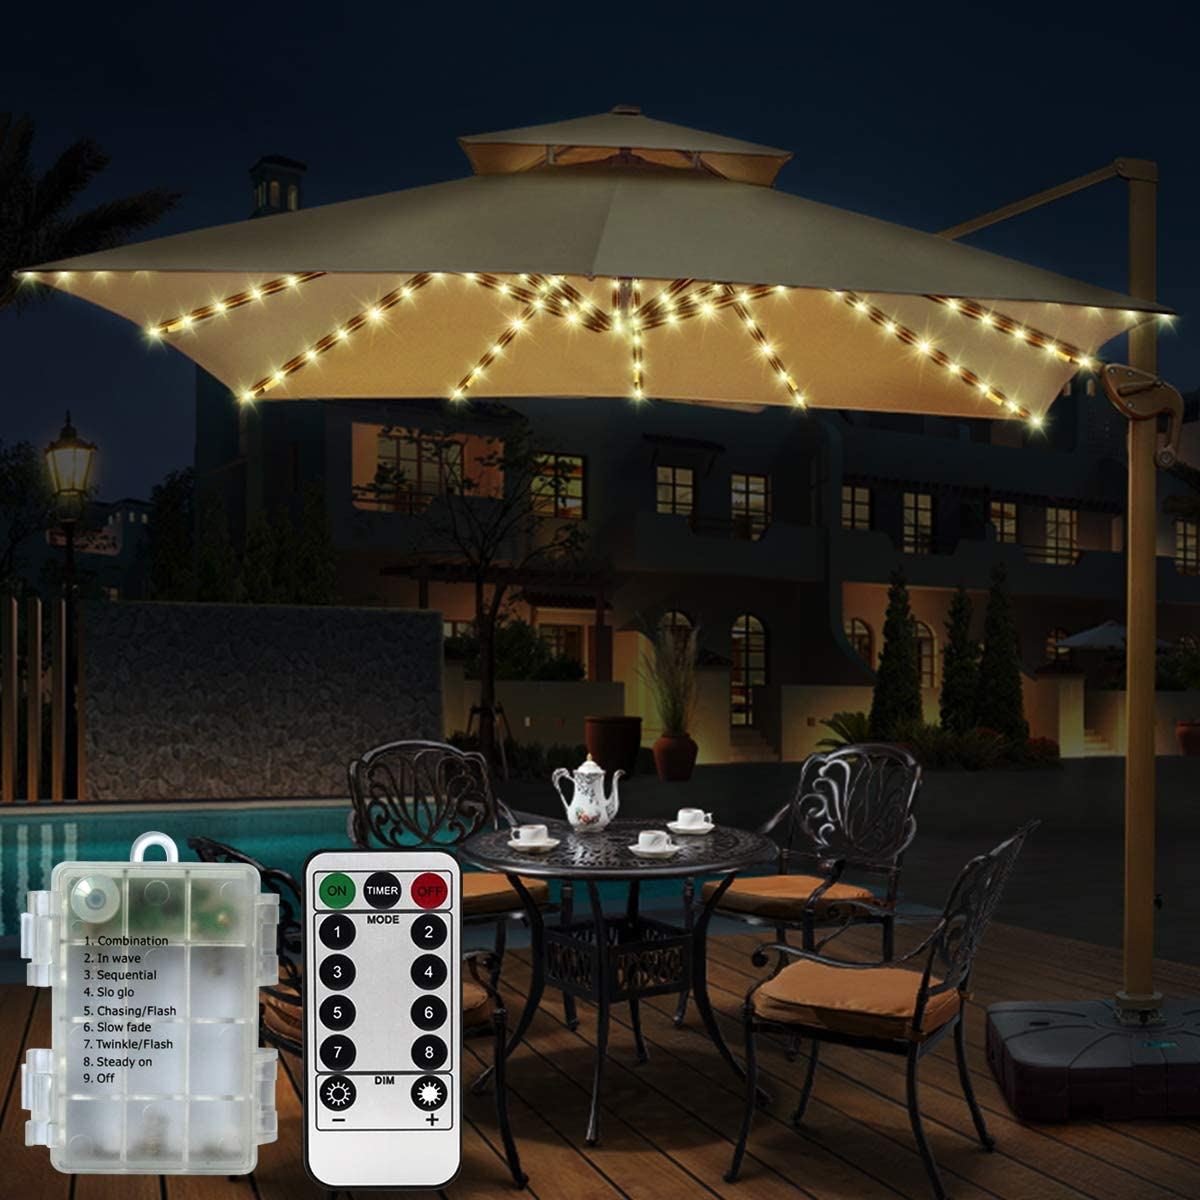 Patio Umbrella Lights 3 Lighting Mode Wireless 28 LED Light Battery Operated